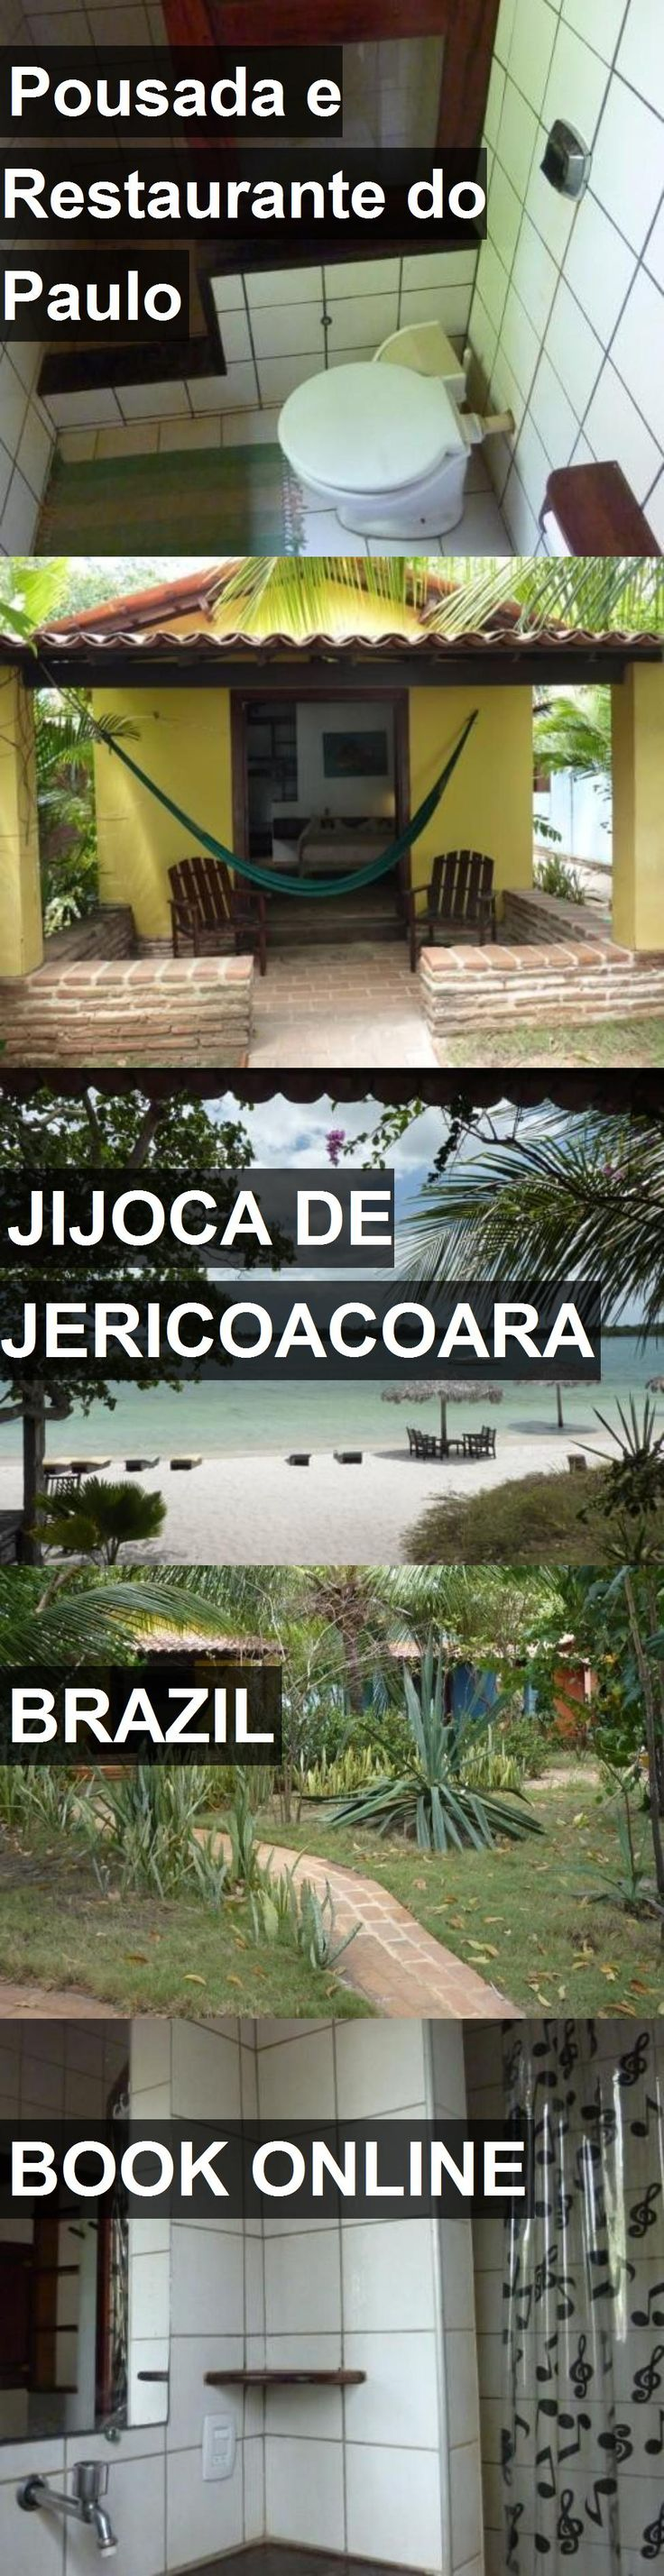 Hotel Pousada e Restaurante do Paulo in Jijoca de Jericoacoara, Brazil. For more information, photos, reviews and best prices please follow the link. #Brazil #JijocadeJericoacoara #travel #vacation #hotel